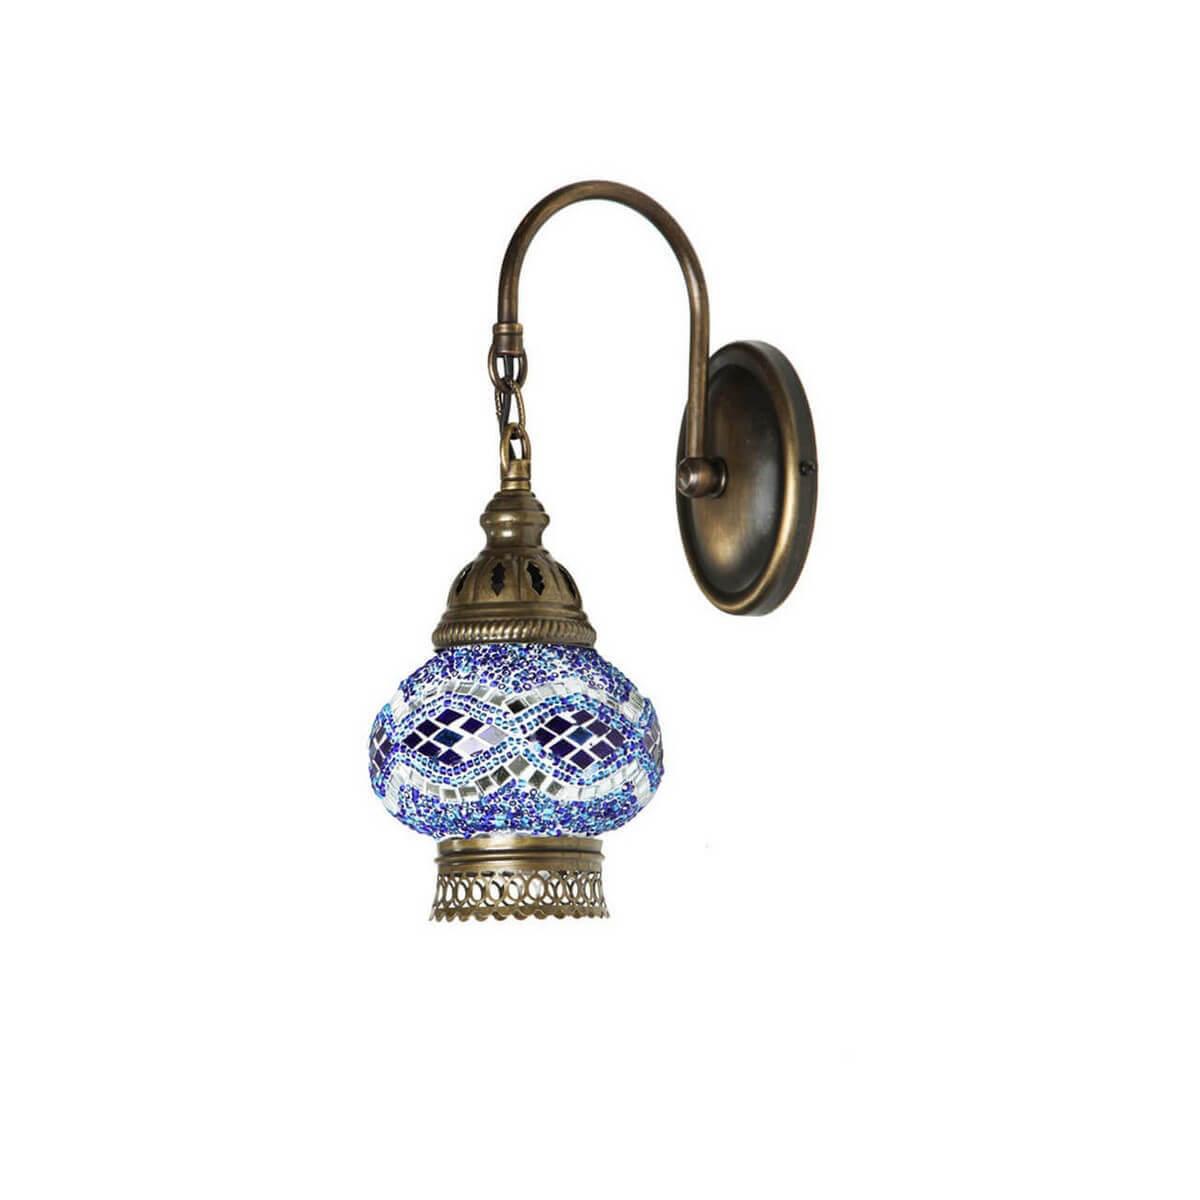 Бра Kink Light 0812TA,05 Марокко косметика из марокко купить